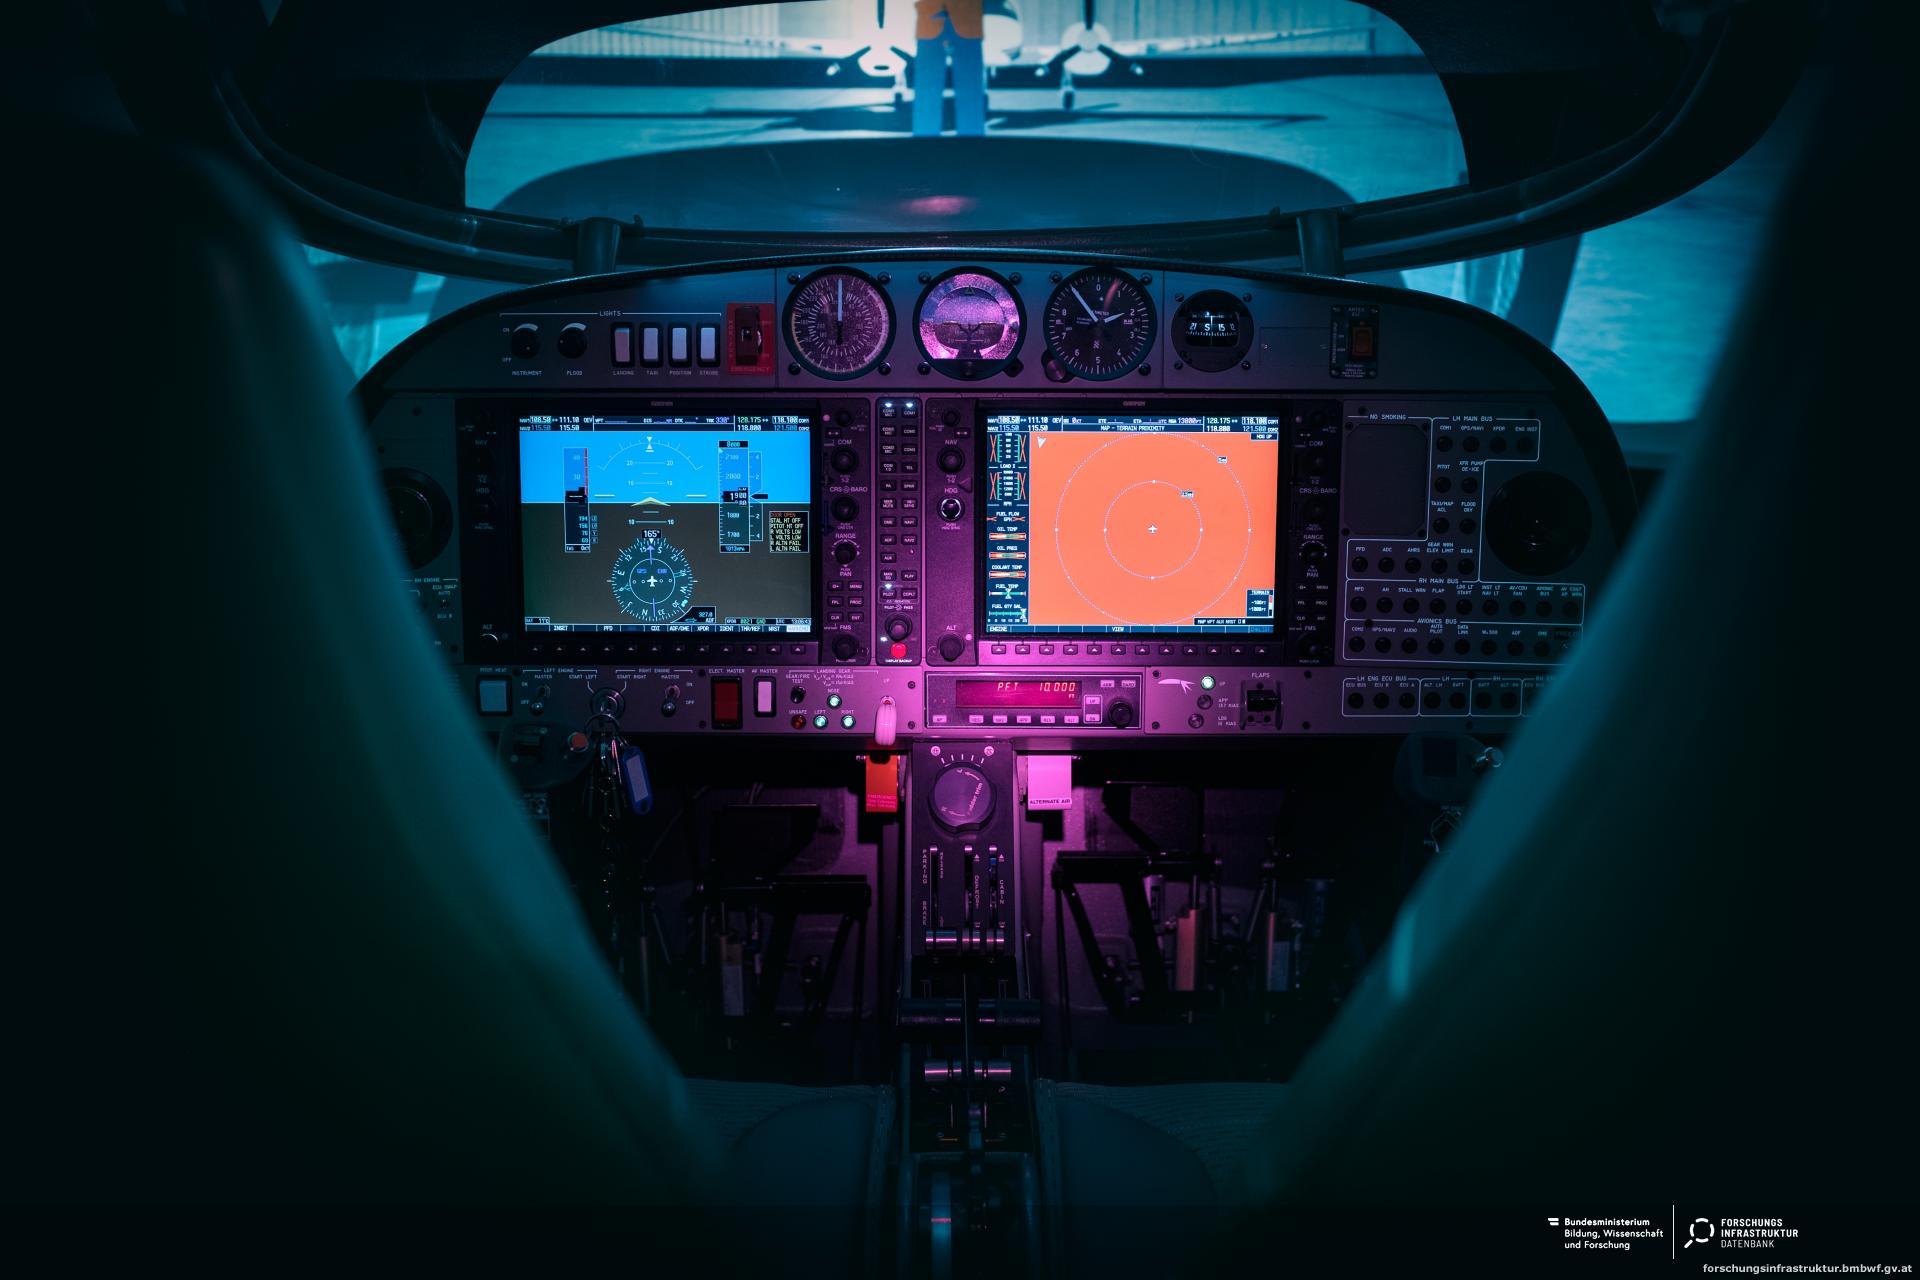 Flightdeck Flight Simulation D-SIM-42 :: Forschungsinfrastruktur